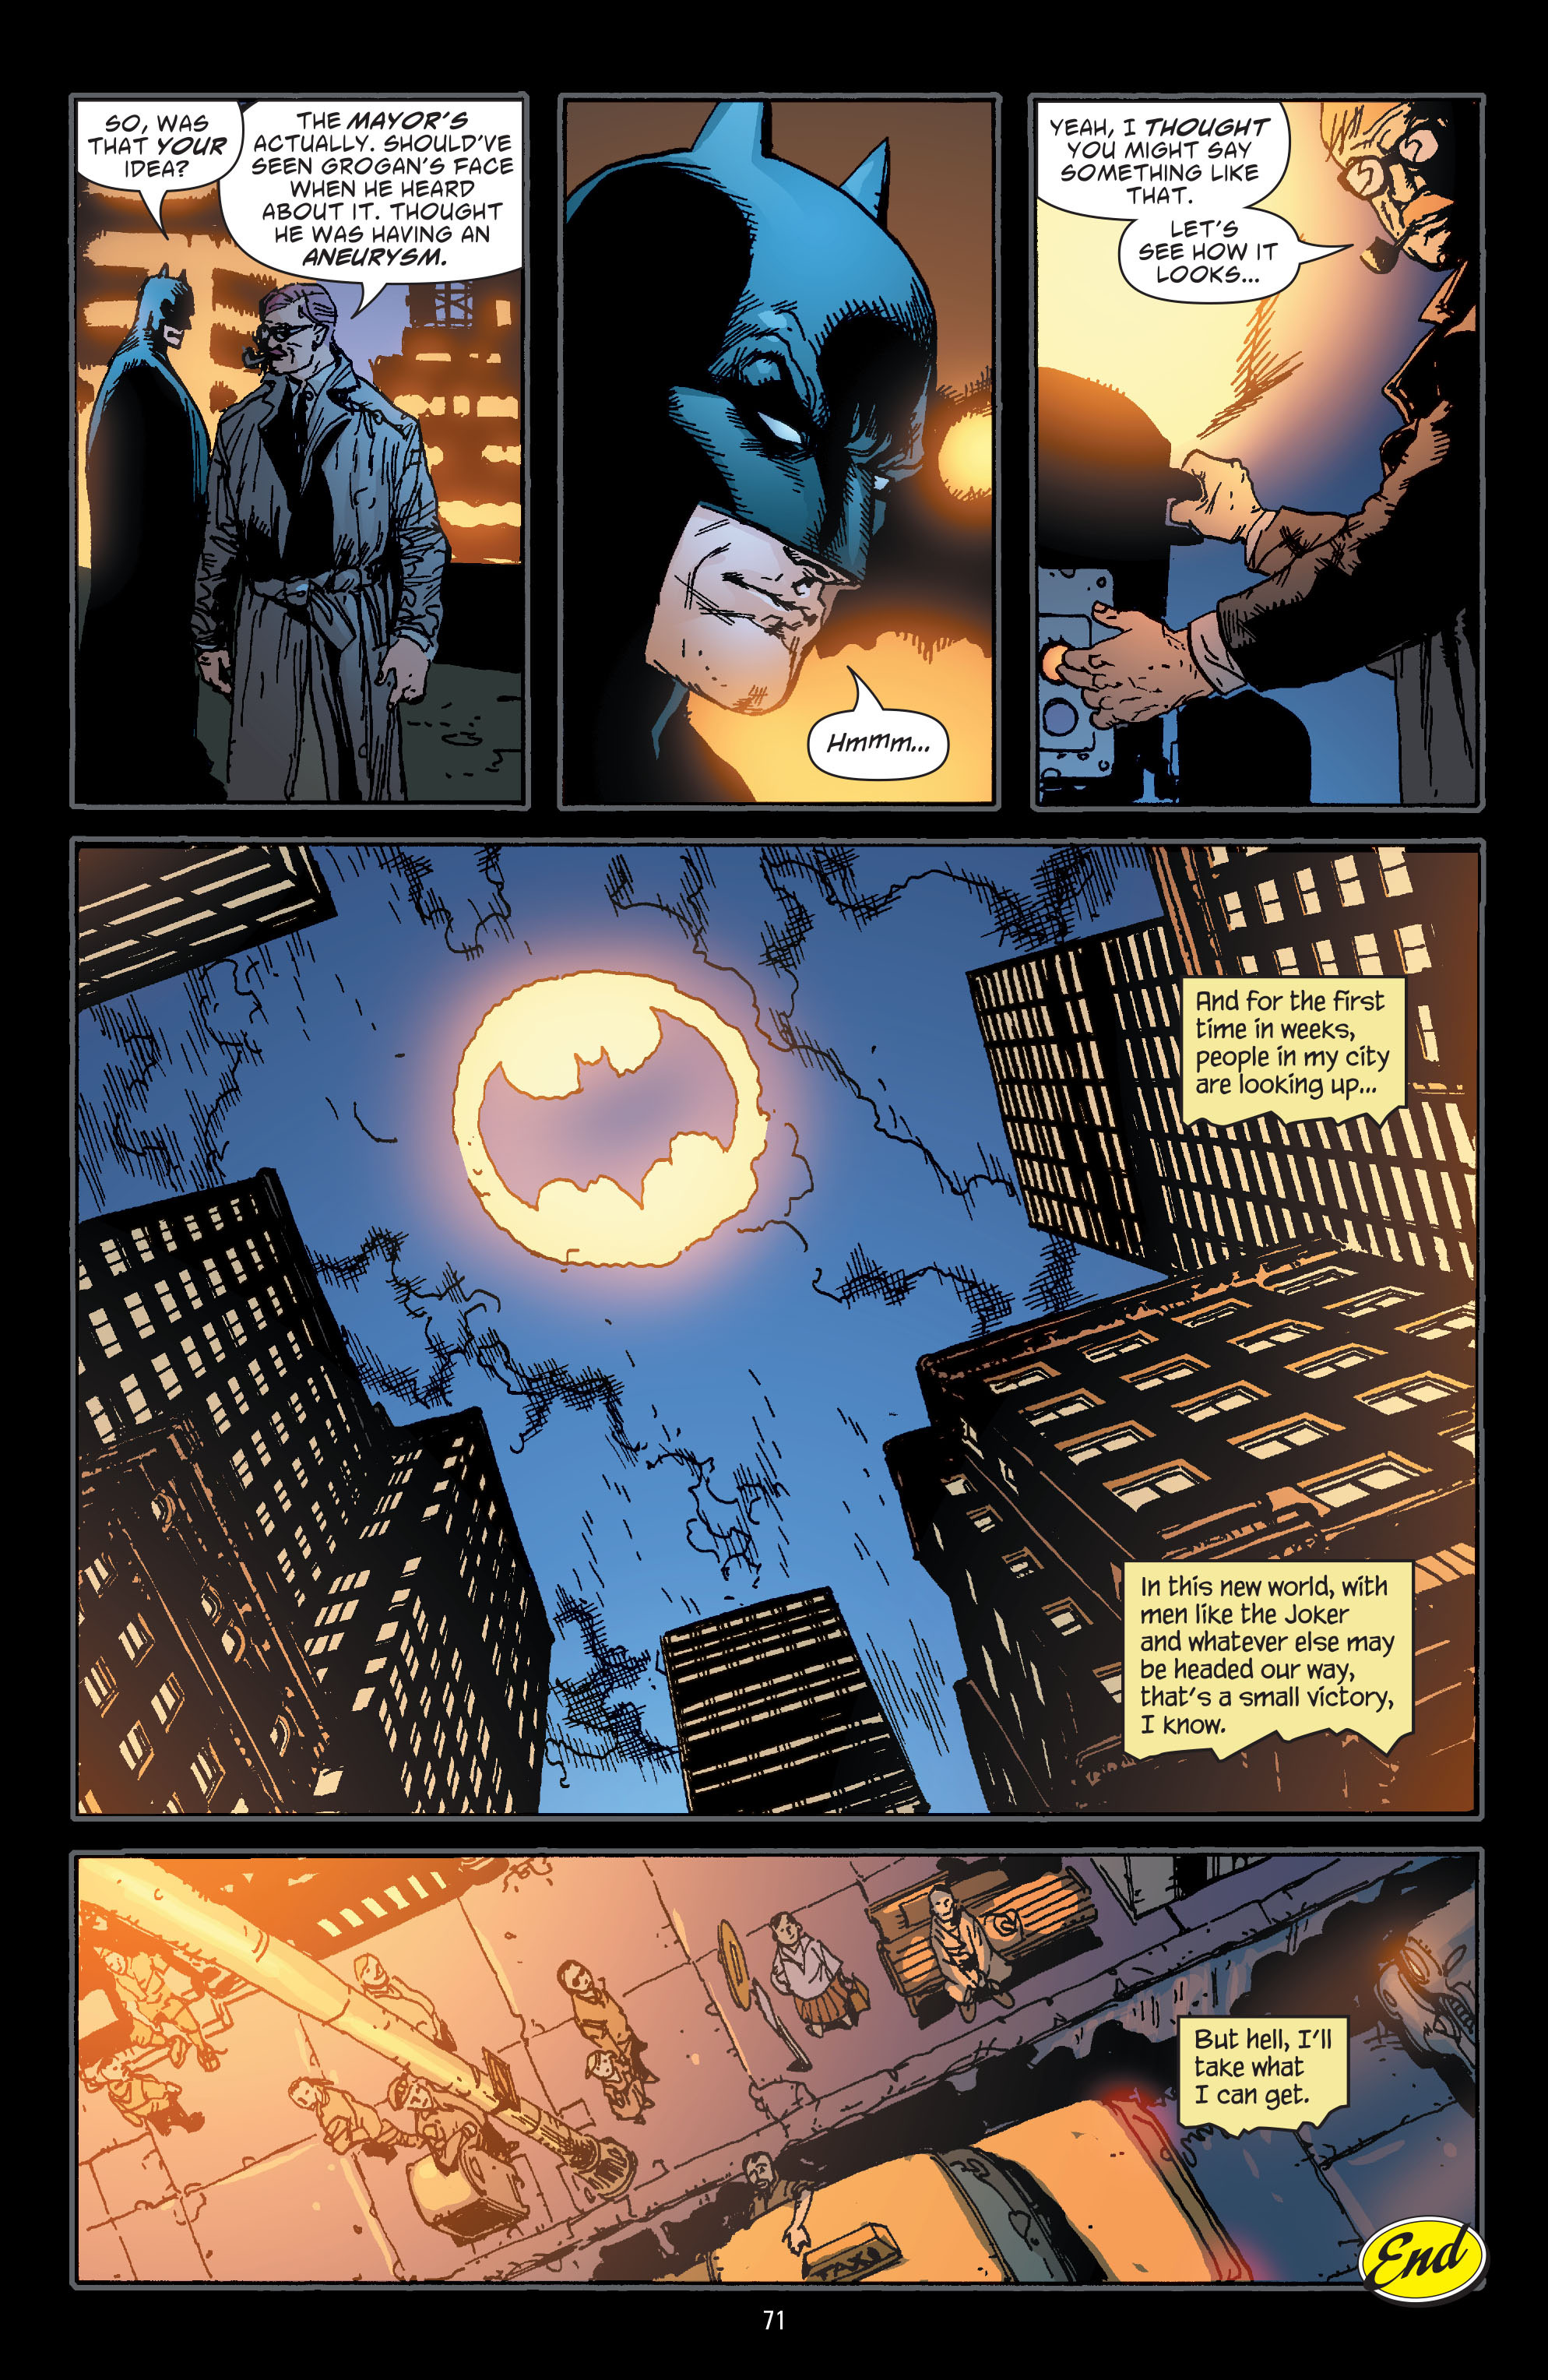 Batman: The Man Who Laughs chap 1 pic 72